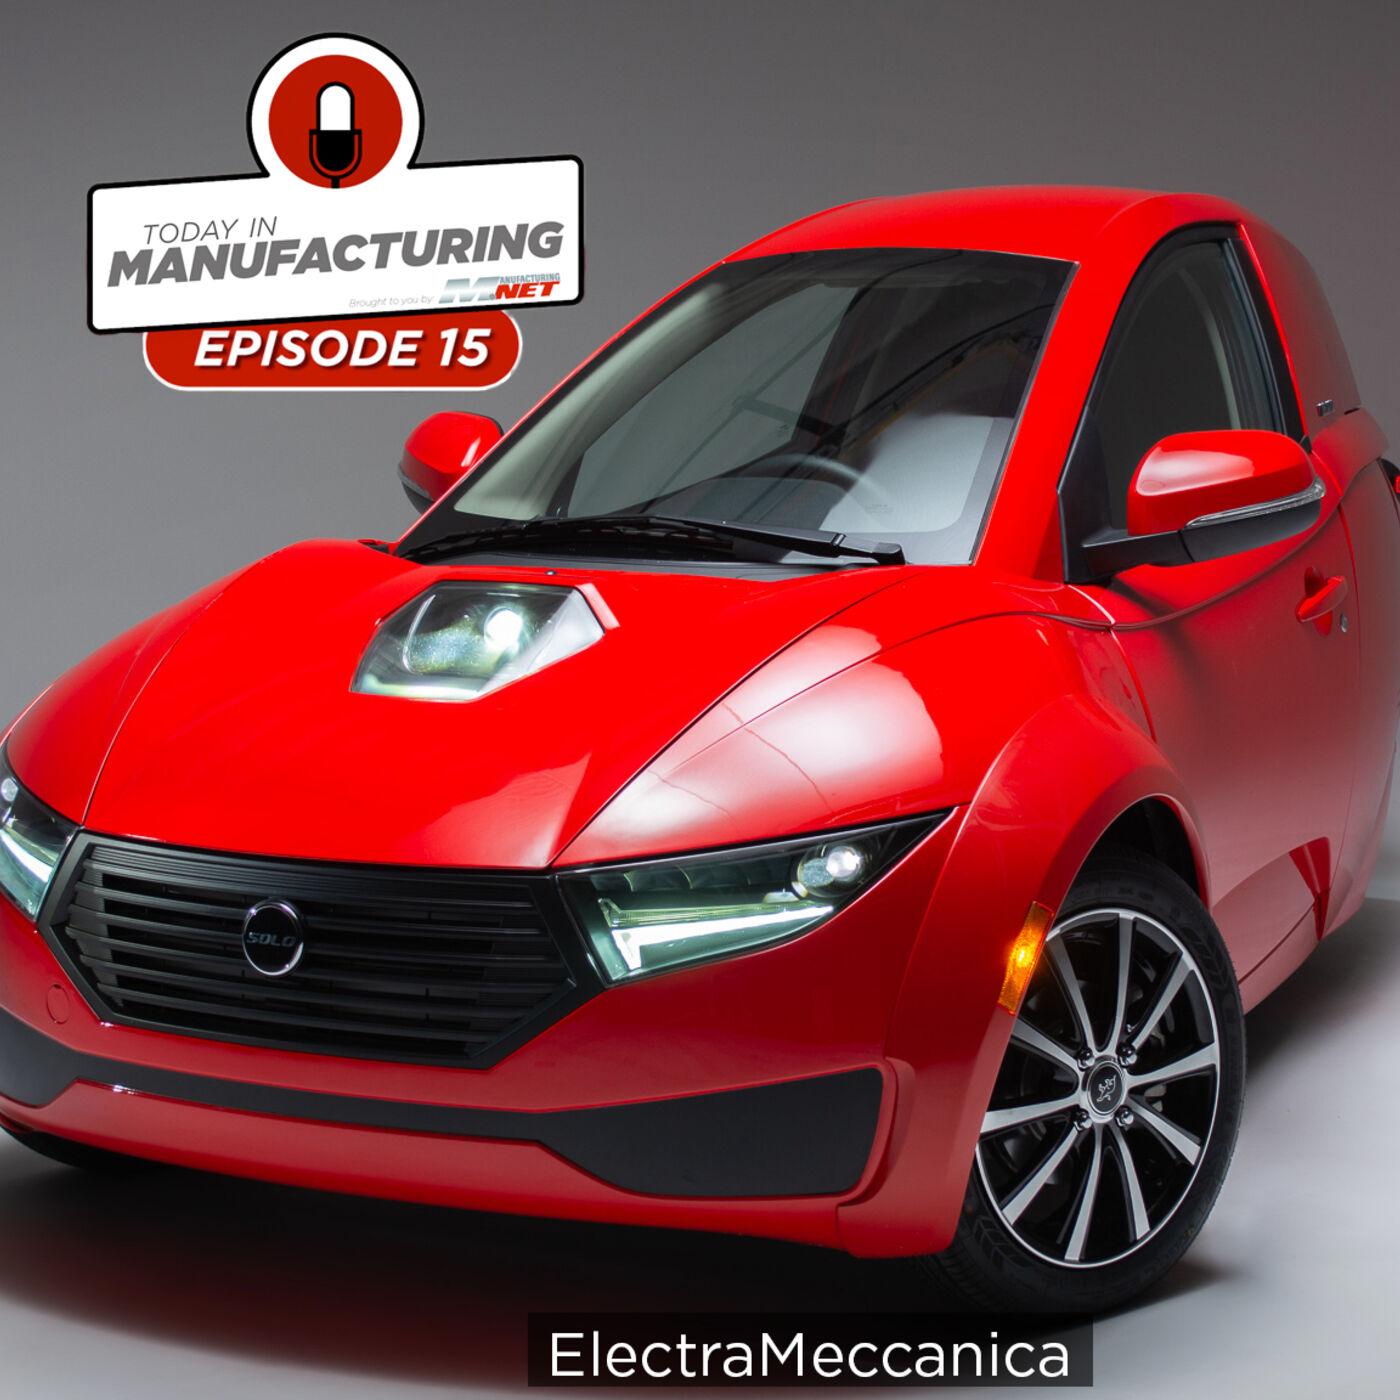 3-Wheeled Cars, Backseat Tesla Drivers, Crack Closes Major Bridge | Today in Manufacturing Ep. 15